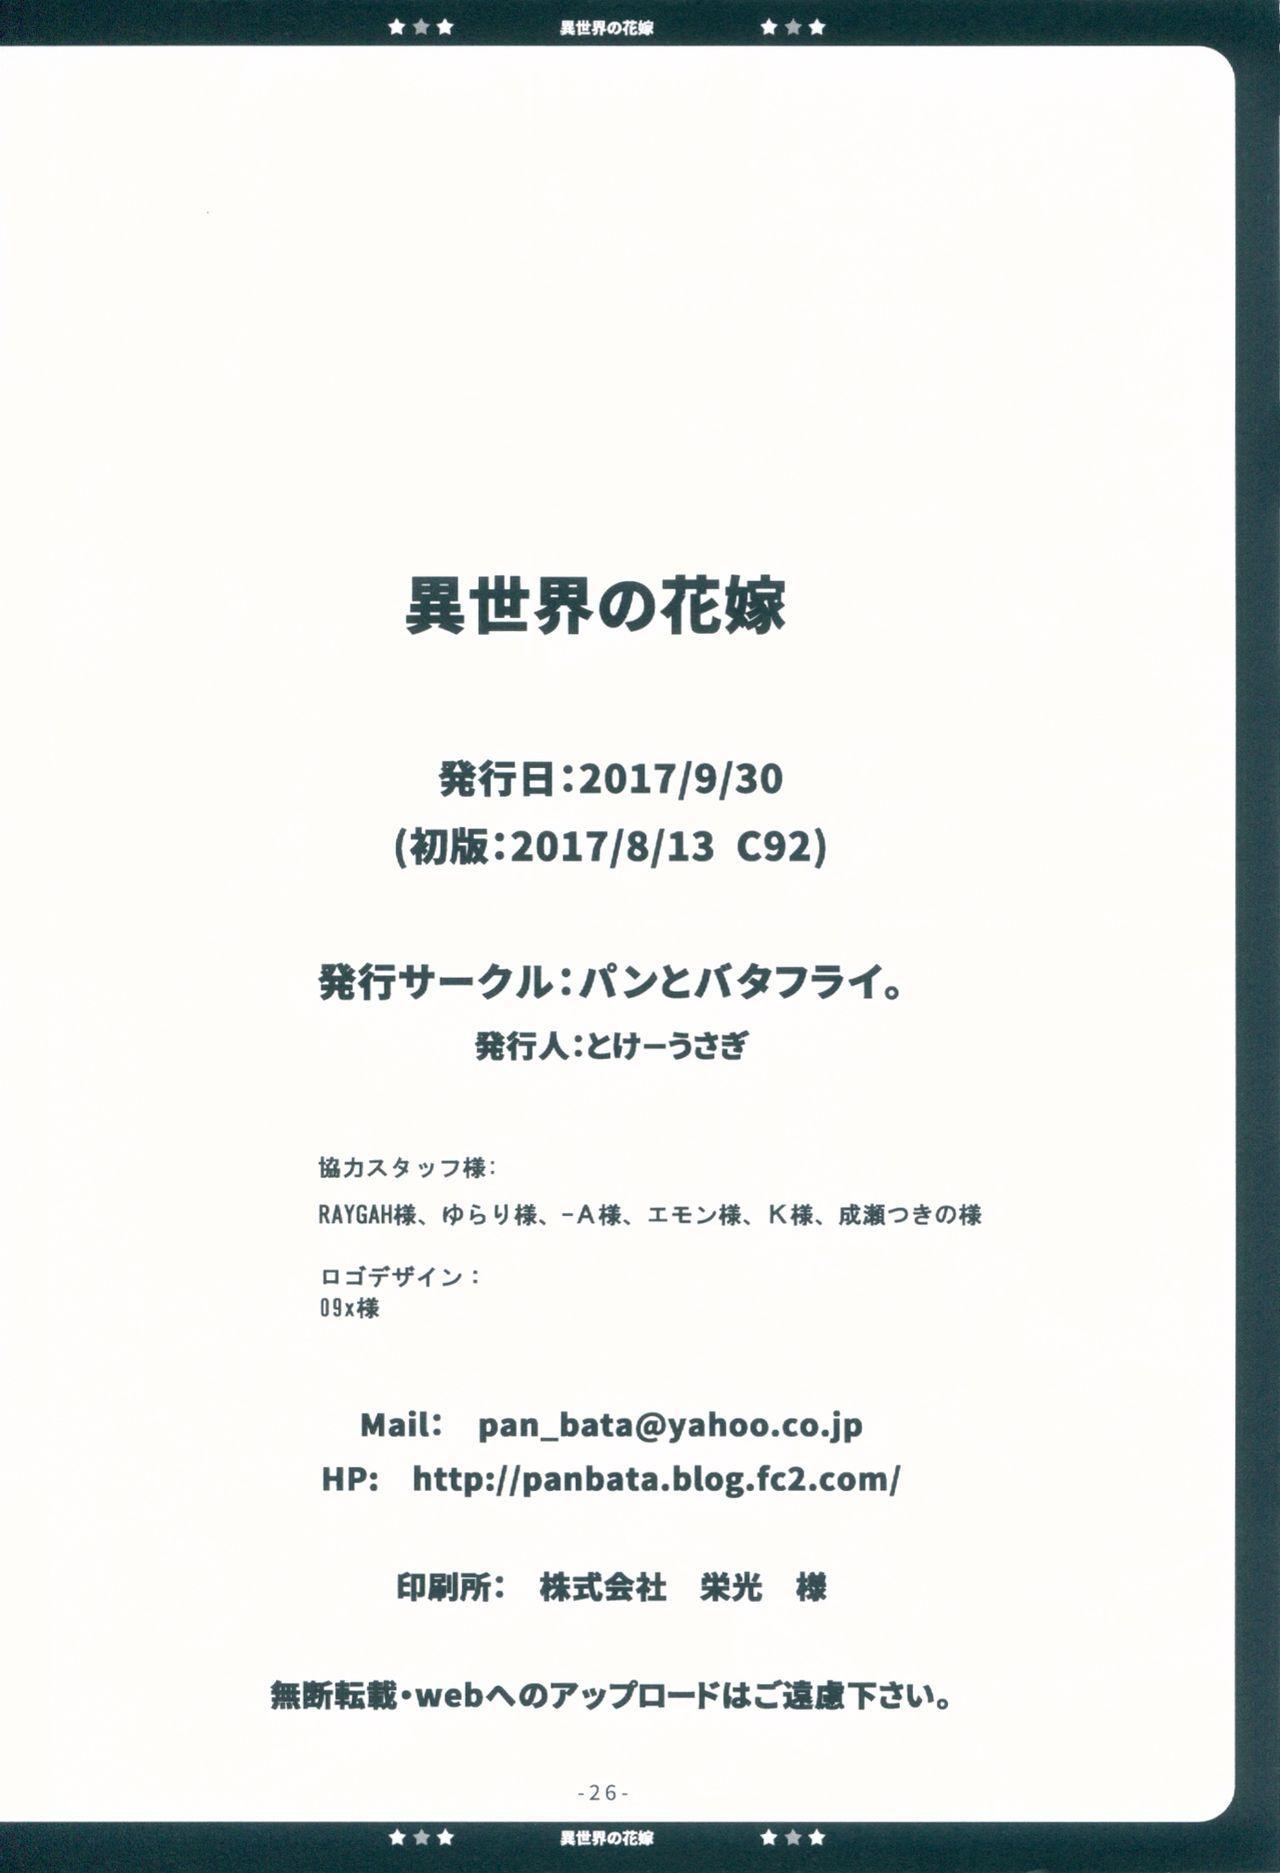 Isekai no Hanayome 26